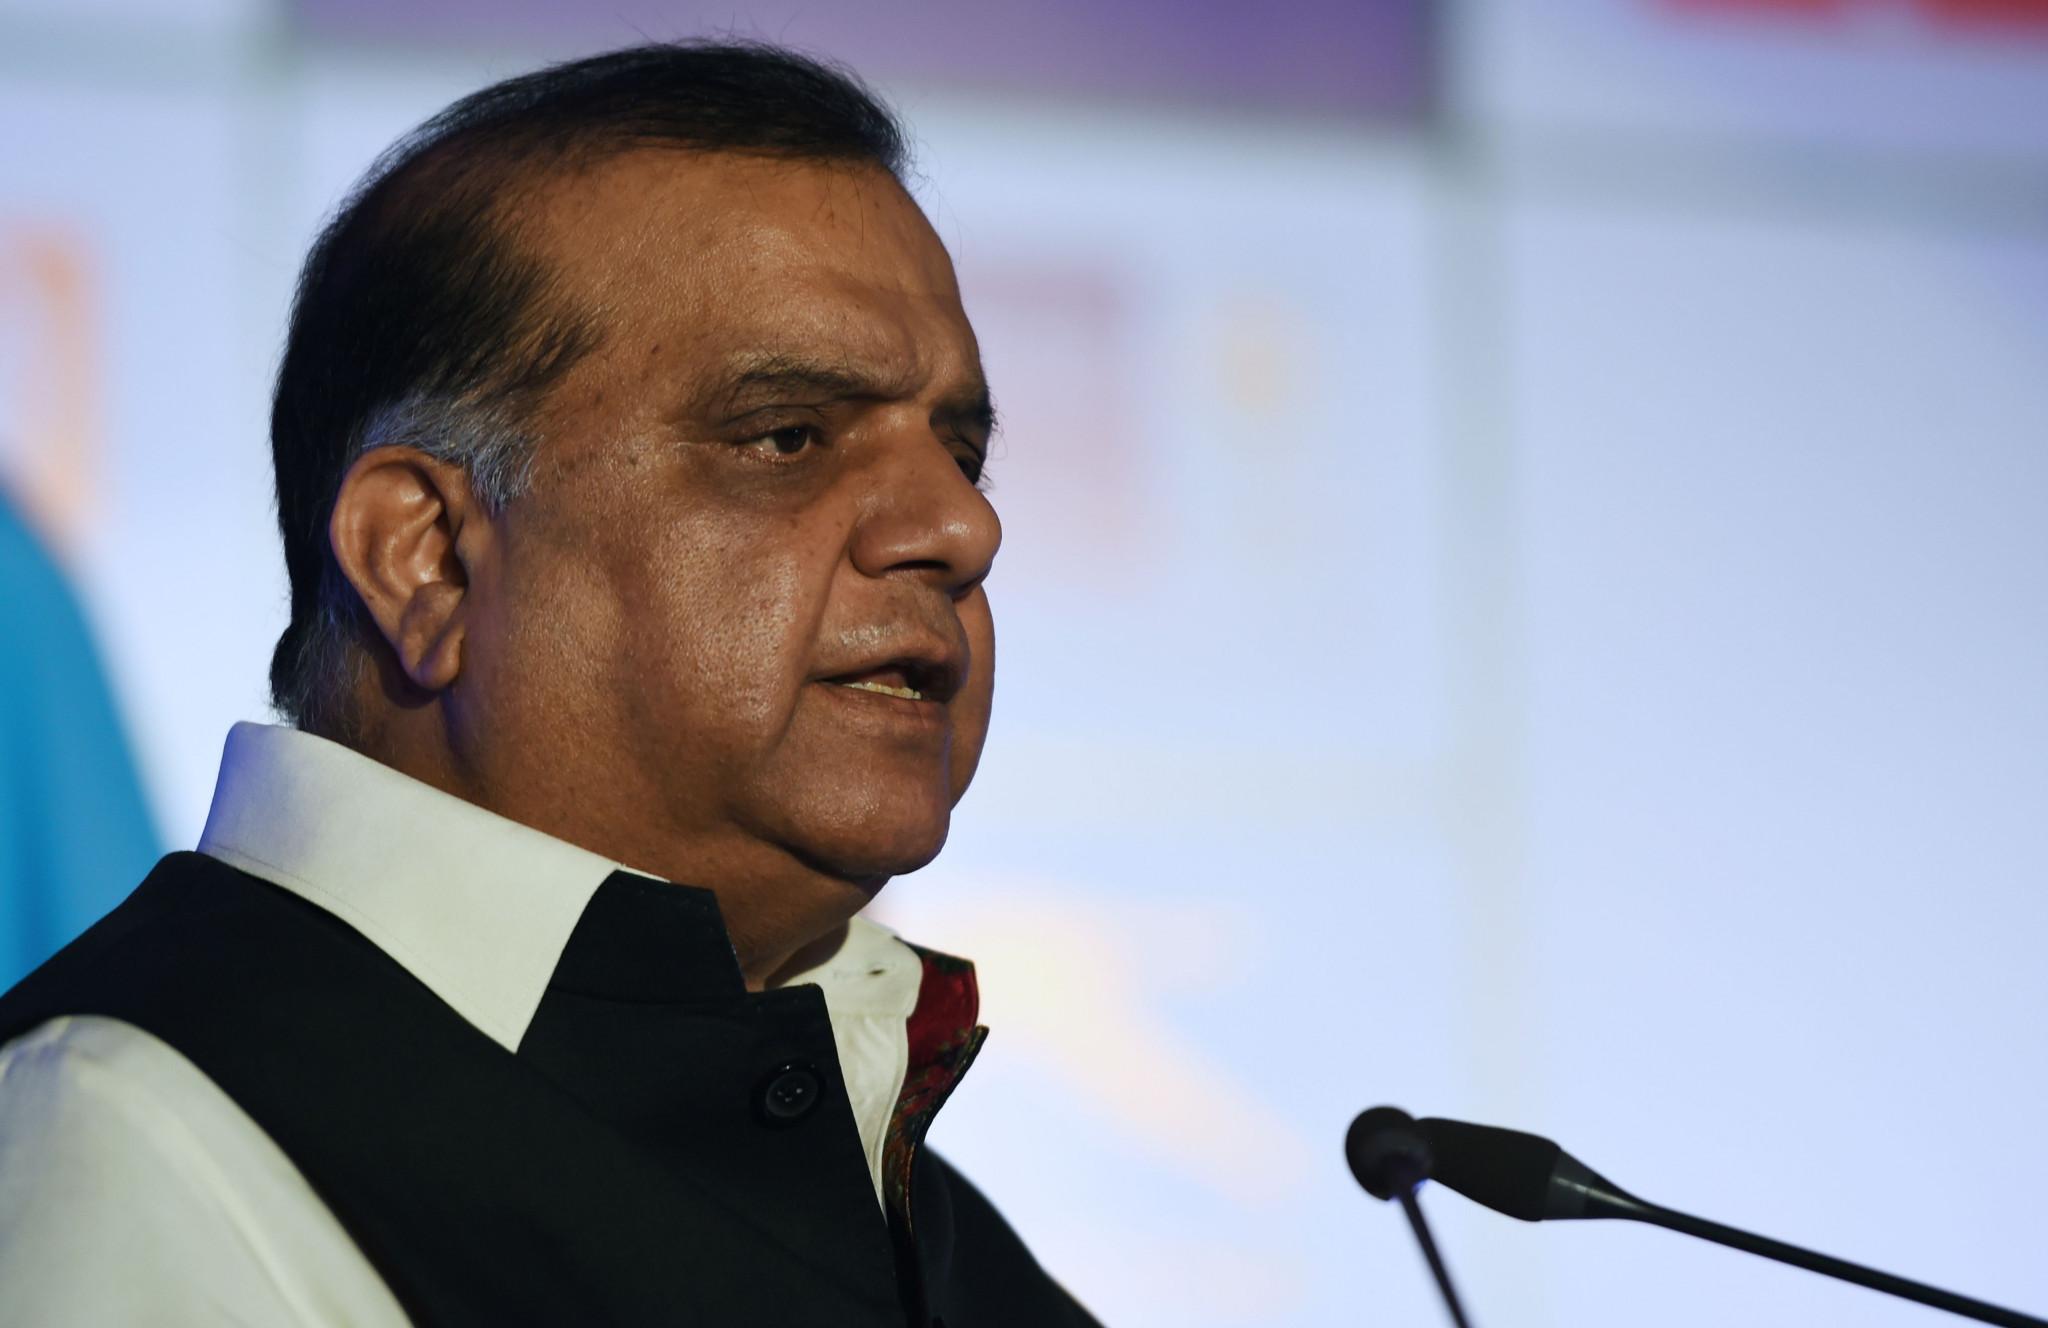 IOA and FIH President Batra suggests India's hockey teams will skip Birmingham 2022 Commonwealth Games